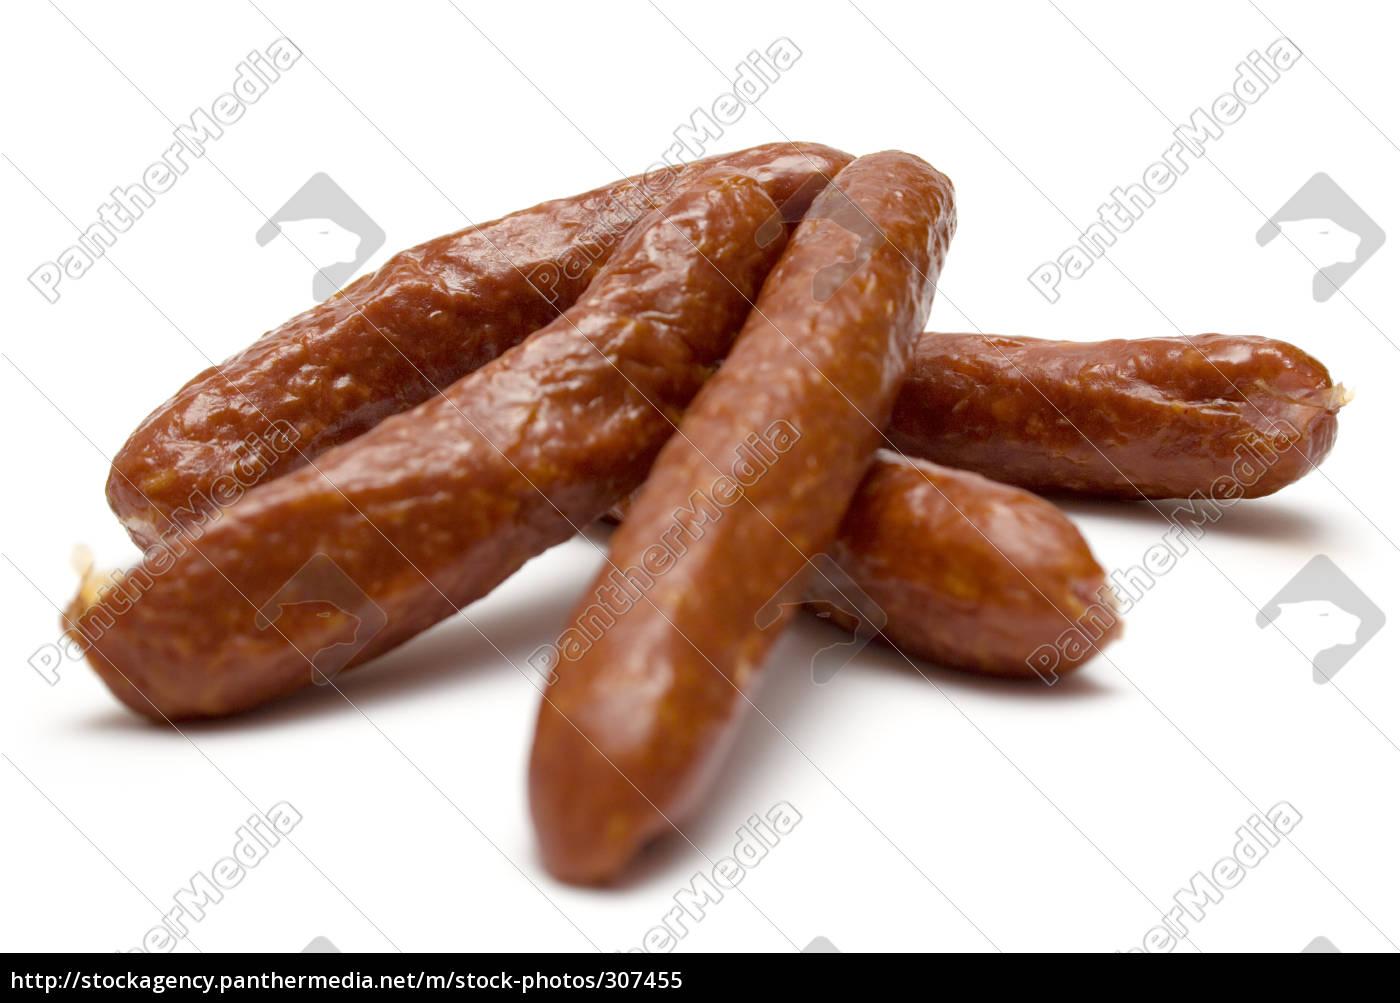 sausages - 307455